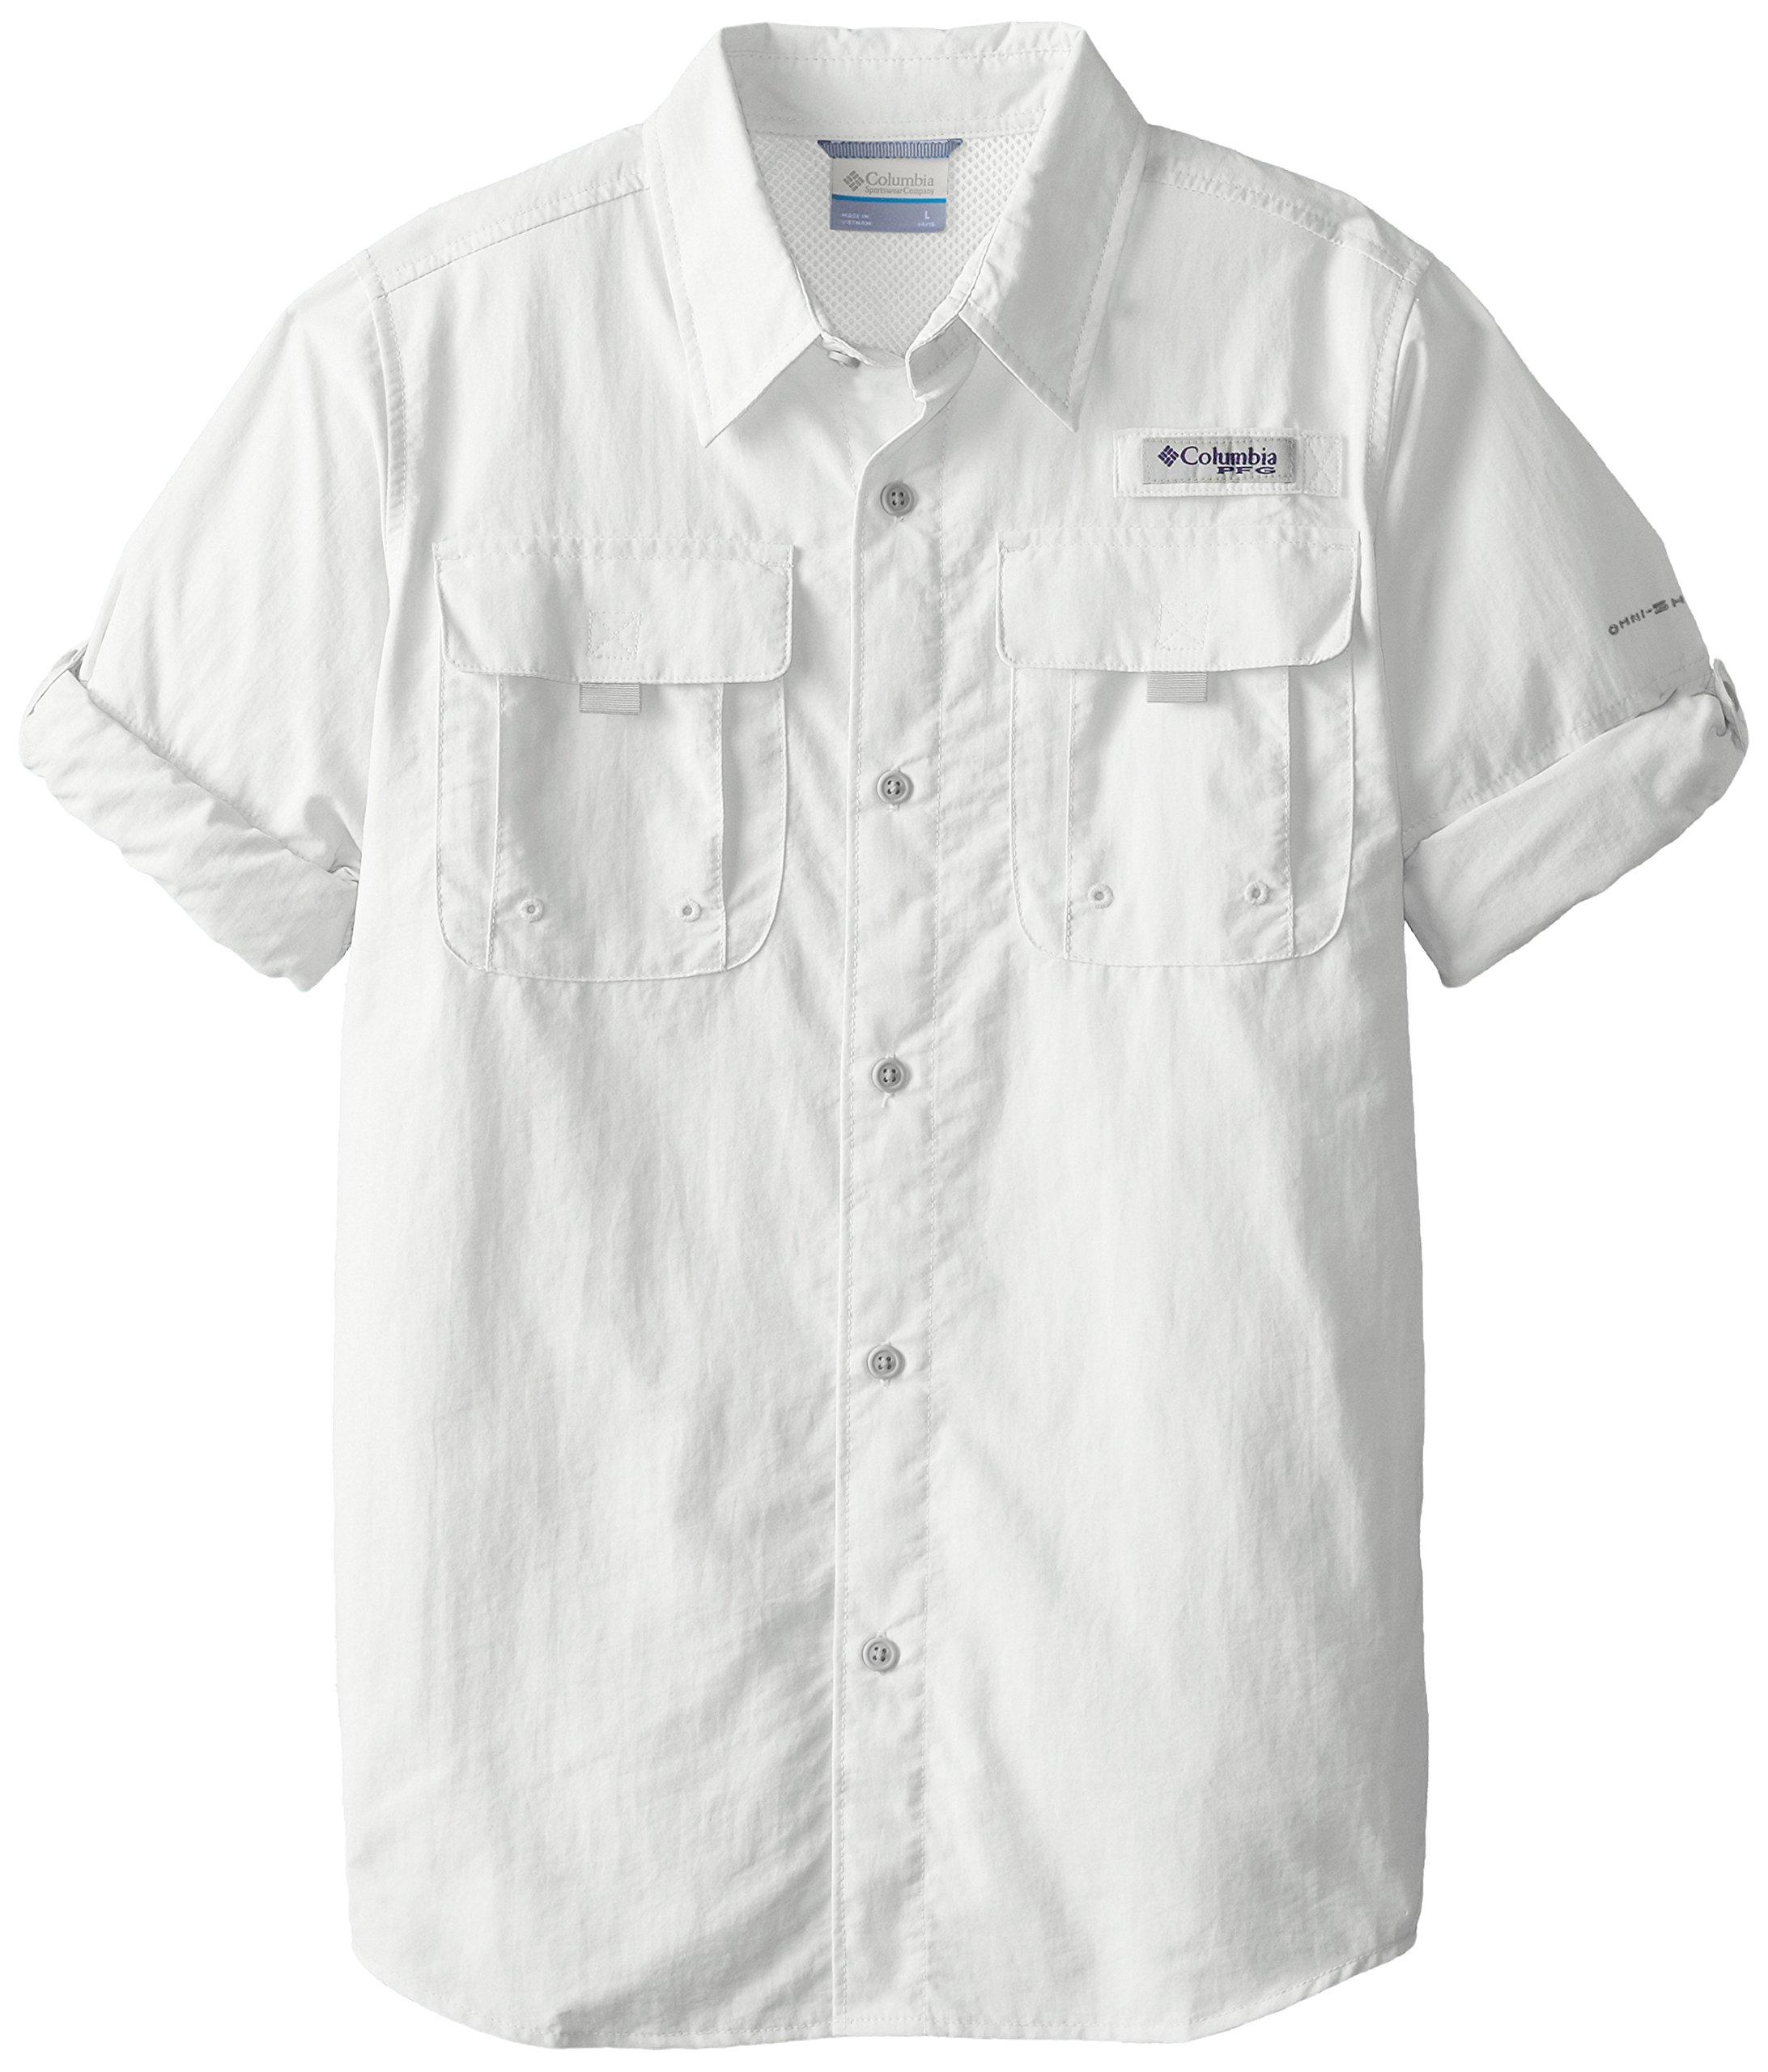 Columbia Sportswear Boy's Bahama Long Sleeve Shirt, White, X-Large